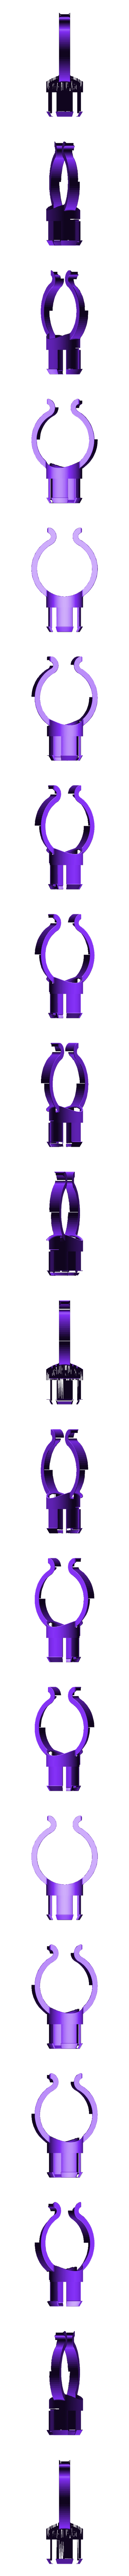 Fixation1.stl Download free STL file Stars • 3D print design, omni-moulage